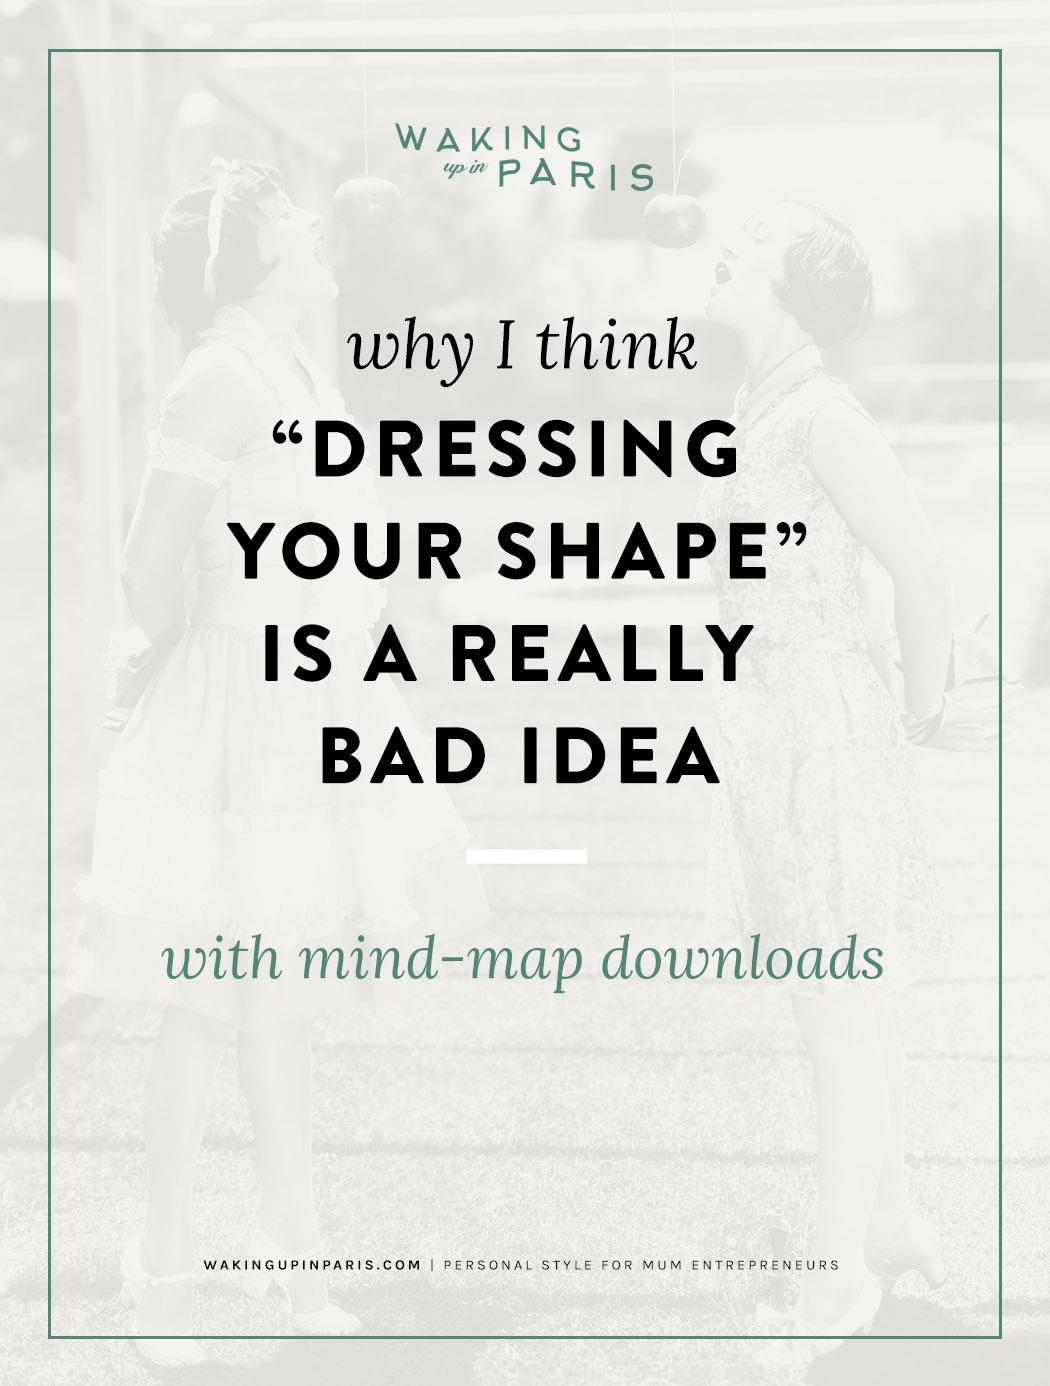 WUIP-clarissa-grace-personal-style-coach-online-mum-entrepreneur-business-dressing-your-shape.jpg